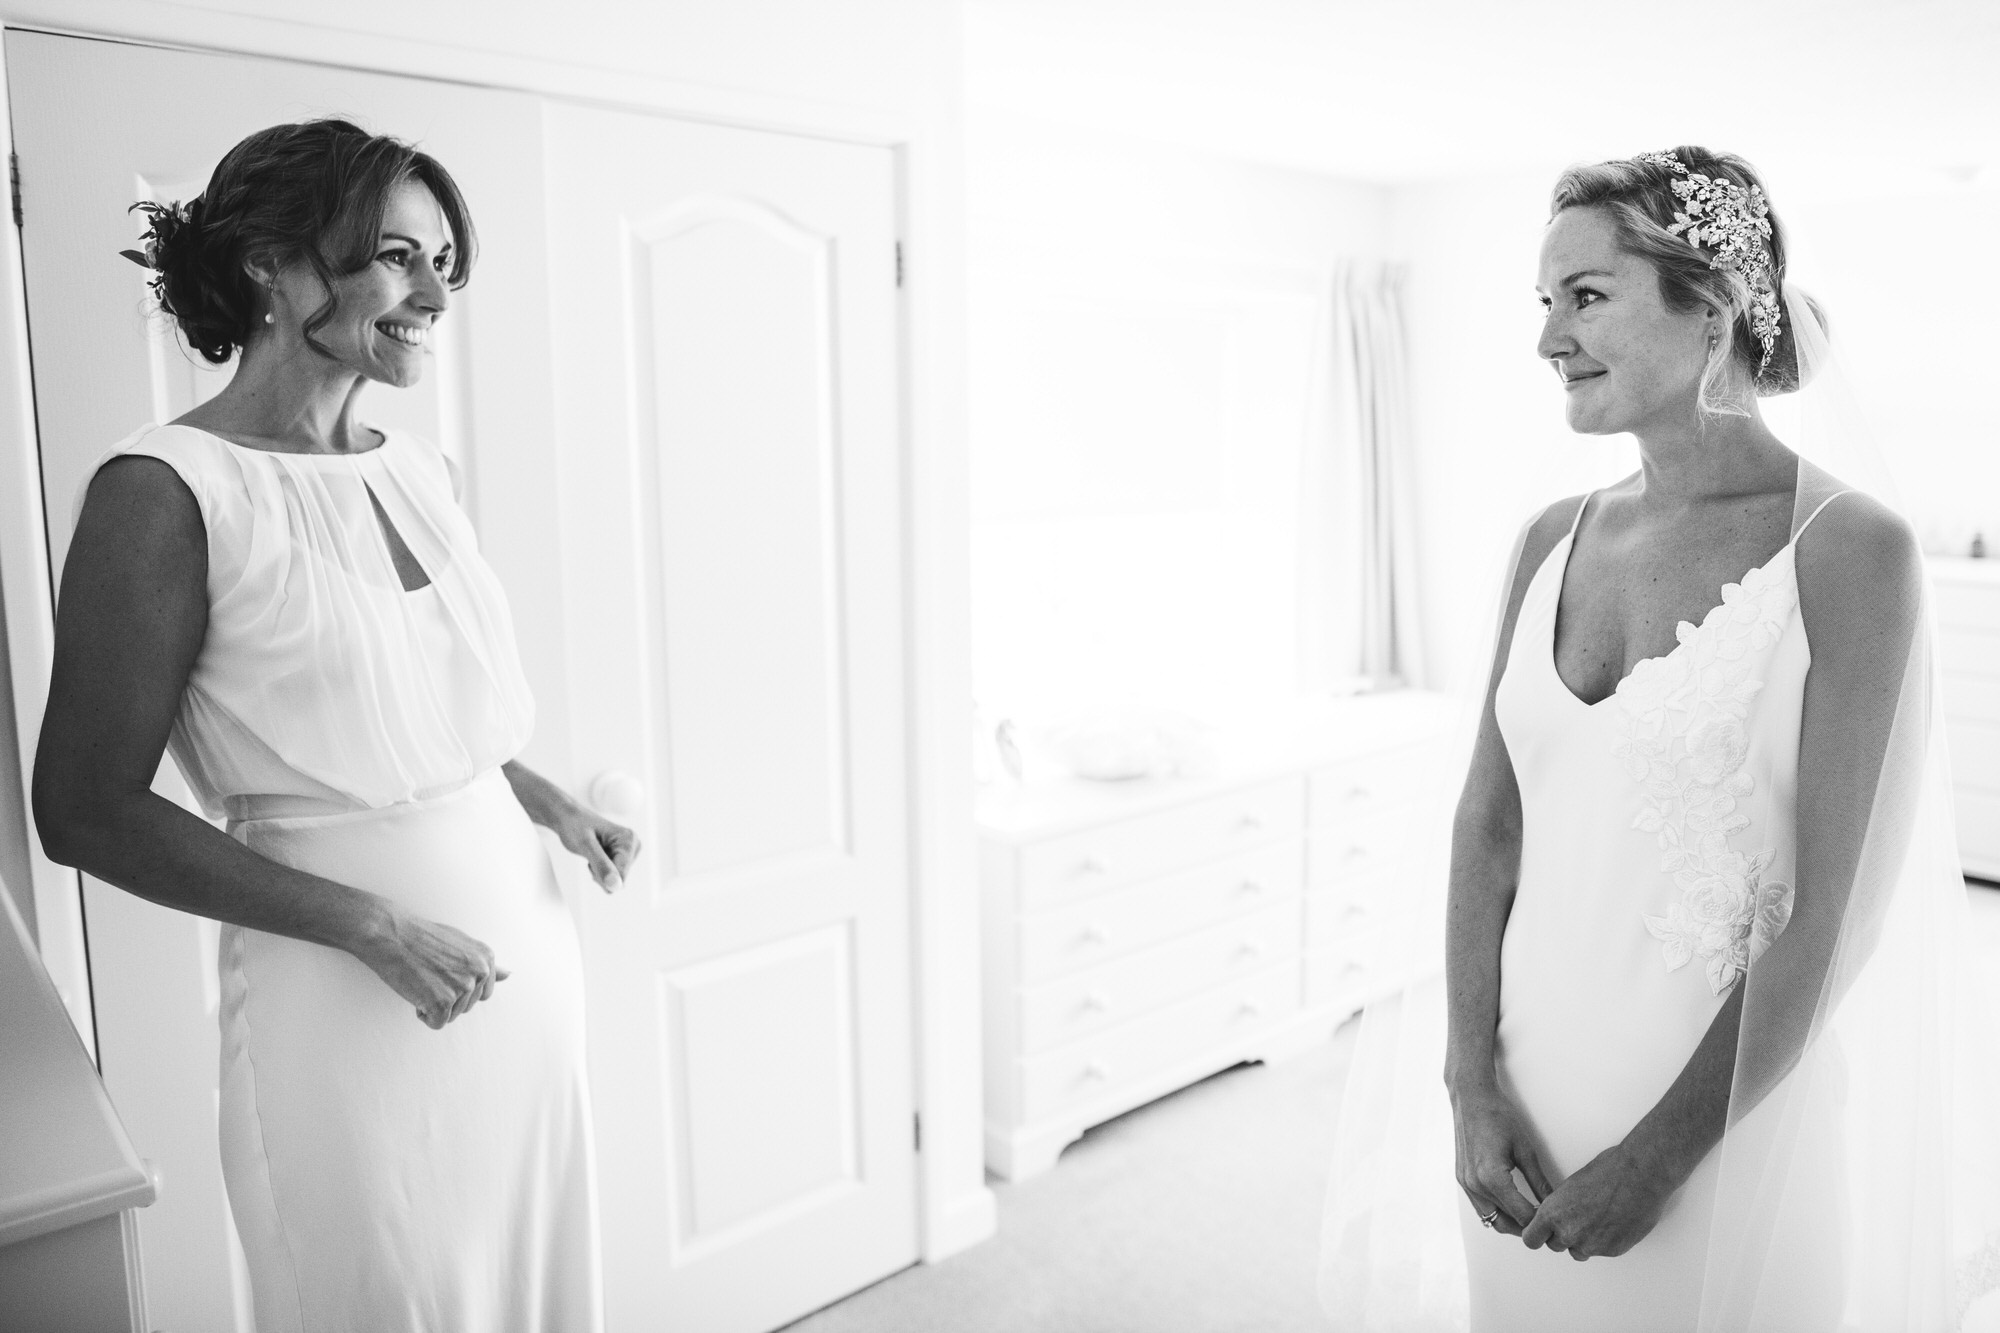 Dorset marquee wedding by the sea simon biffen photography 7